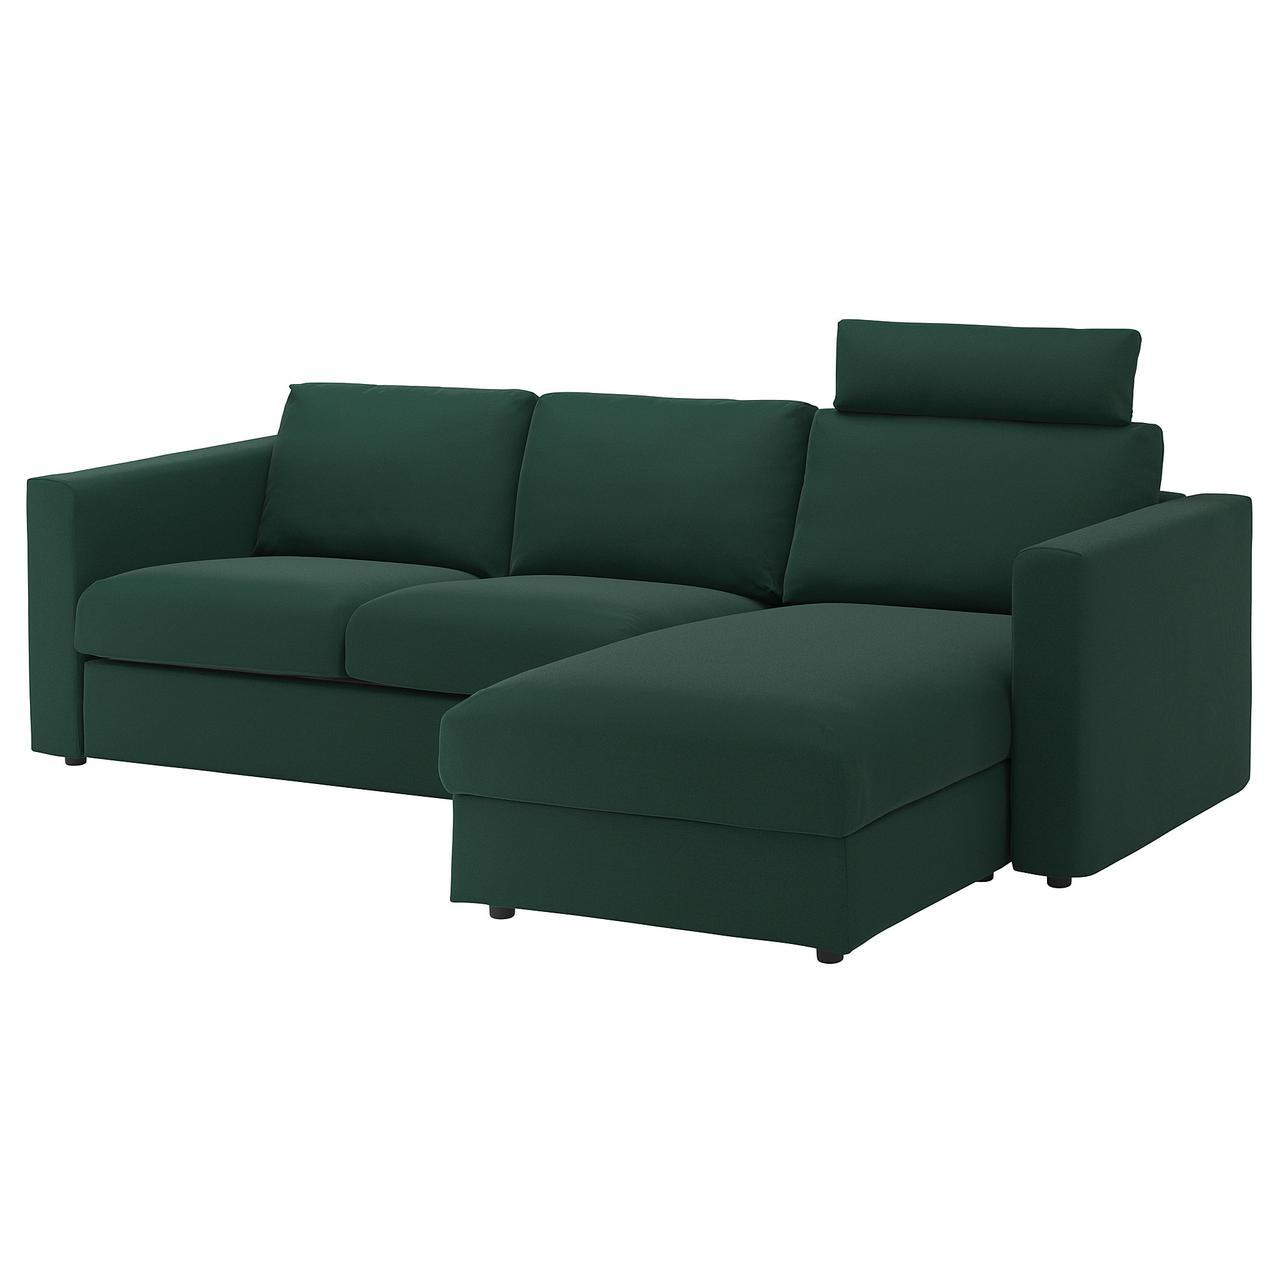 IKEA VIMLE (392.567.02) 3-местный диван, с шезлонгом